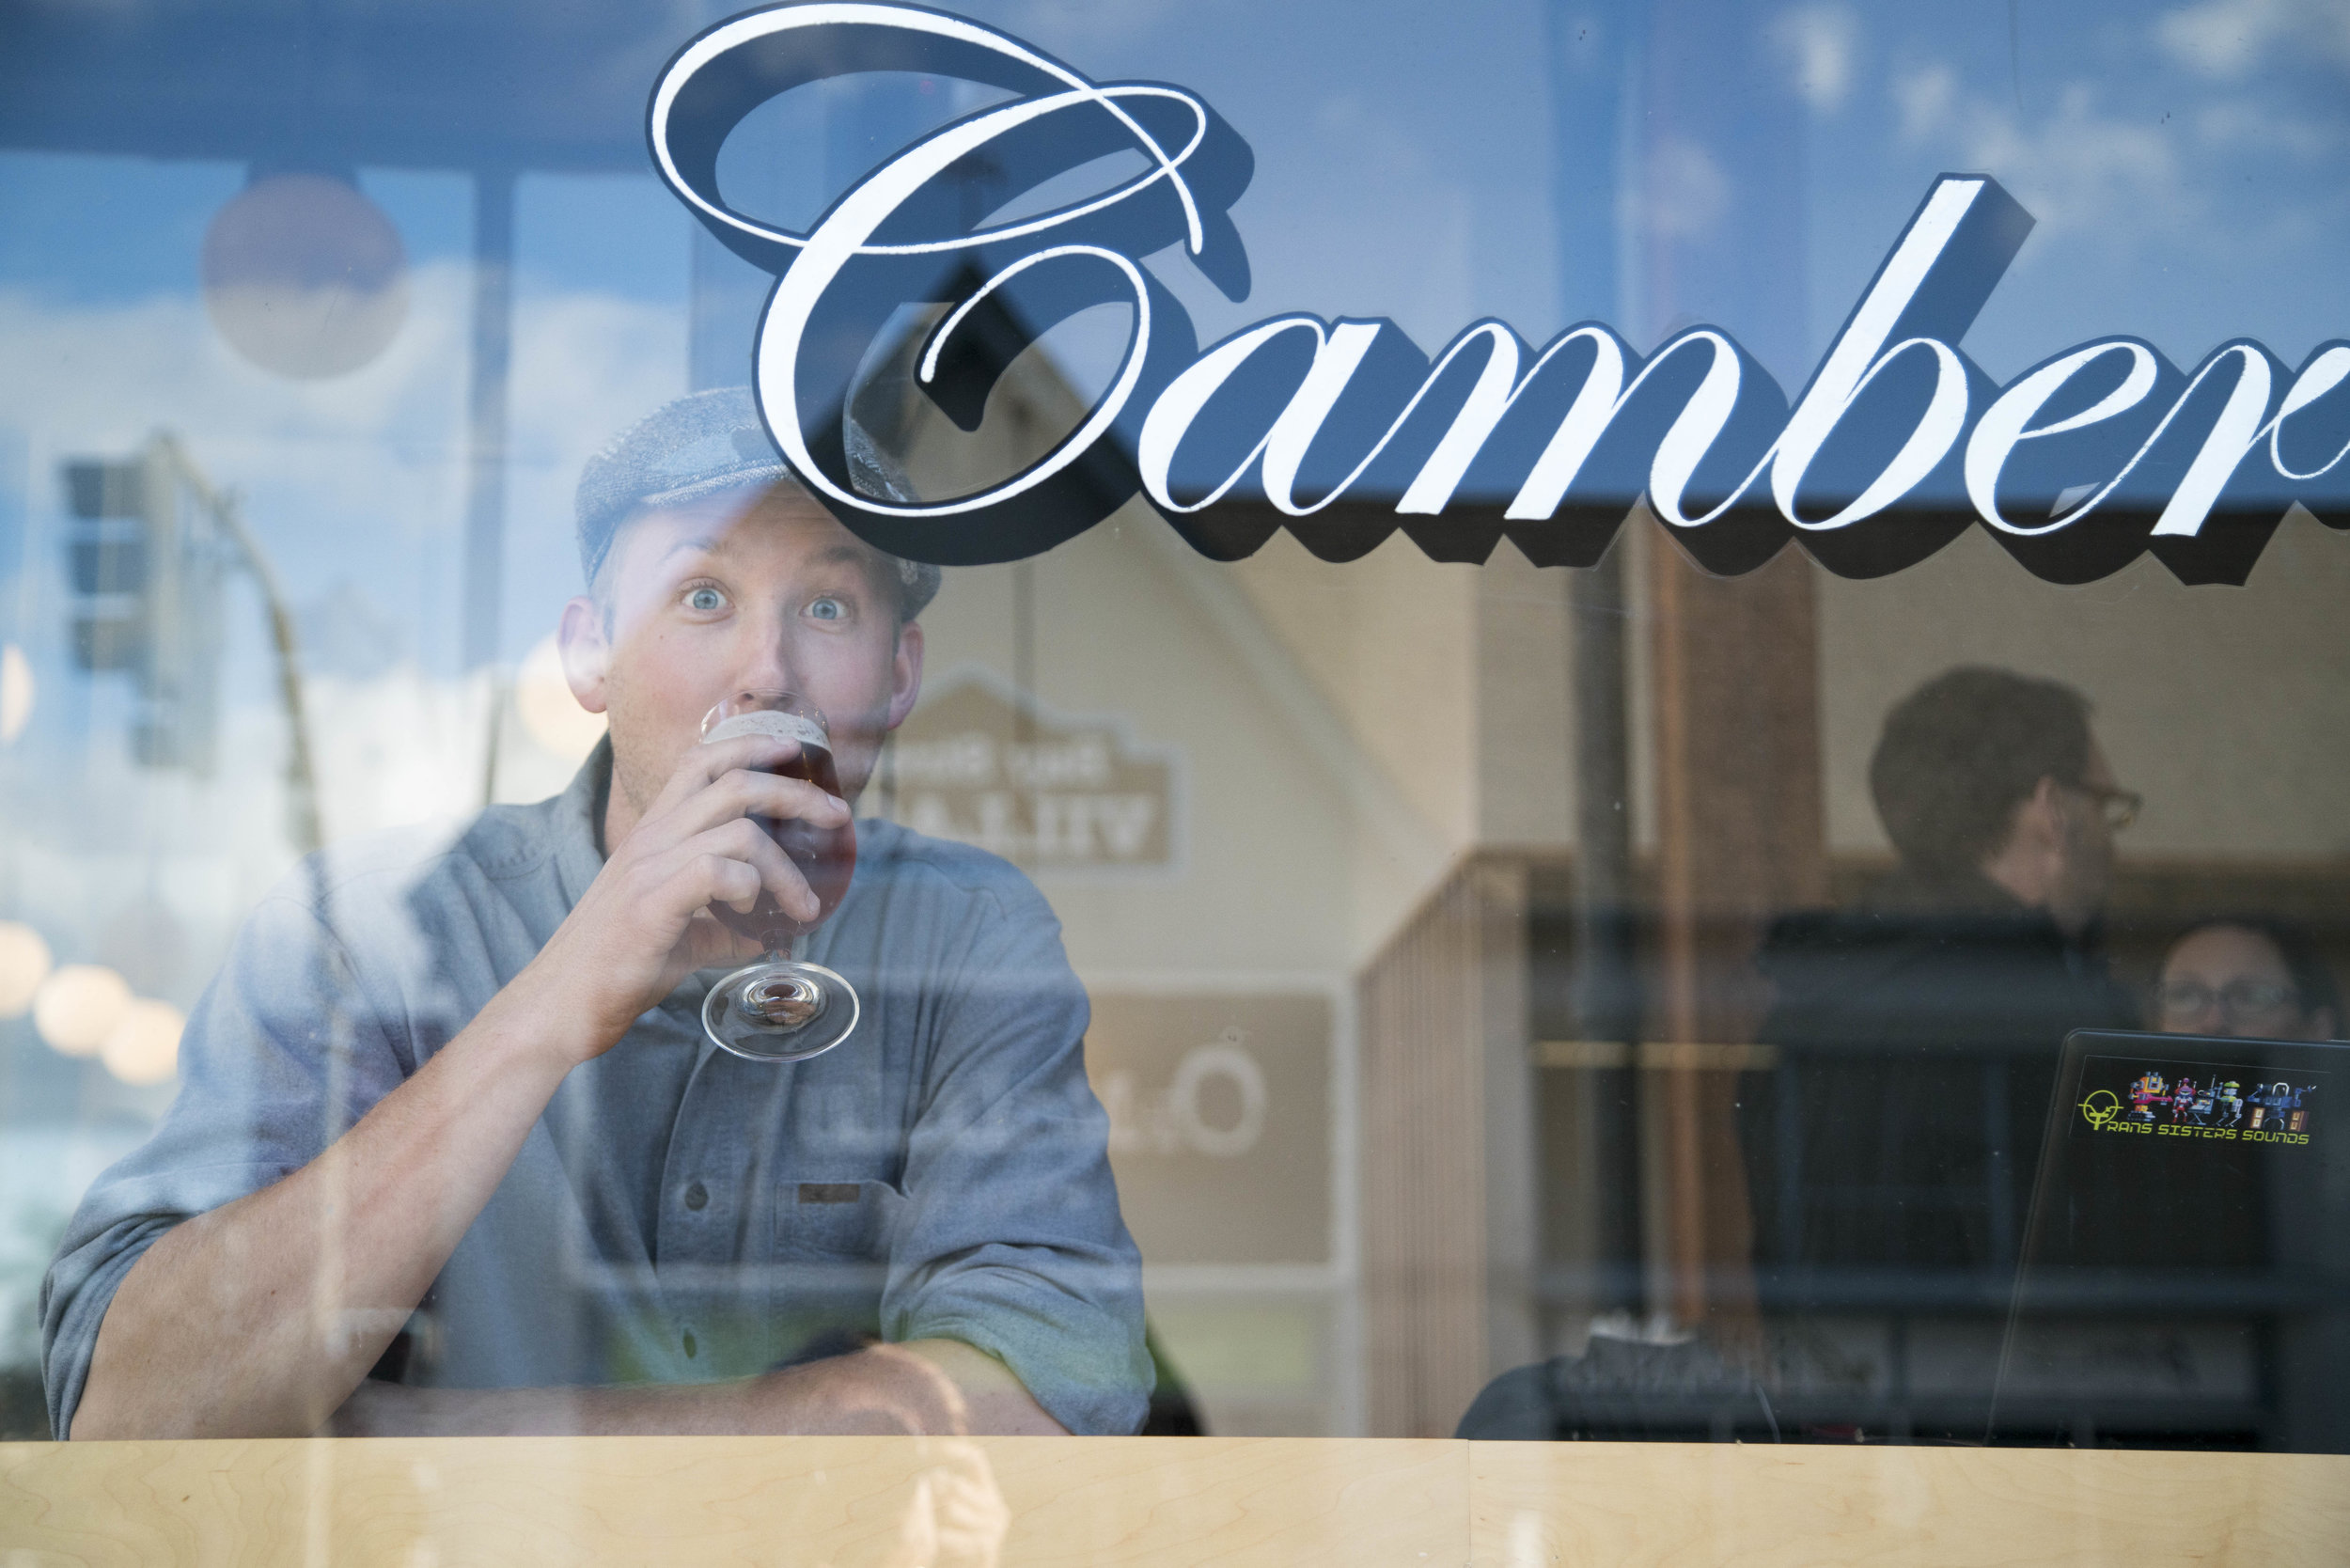 David Yake at flagship Camber Coffee. Photo: David Yake